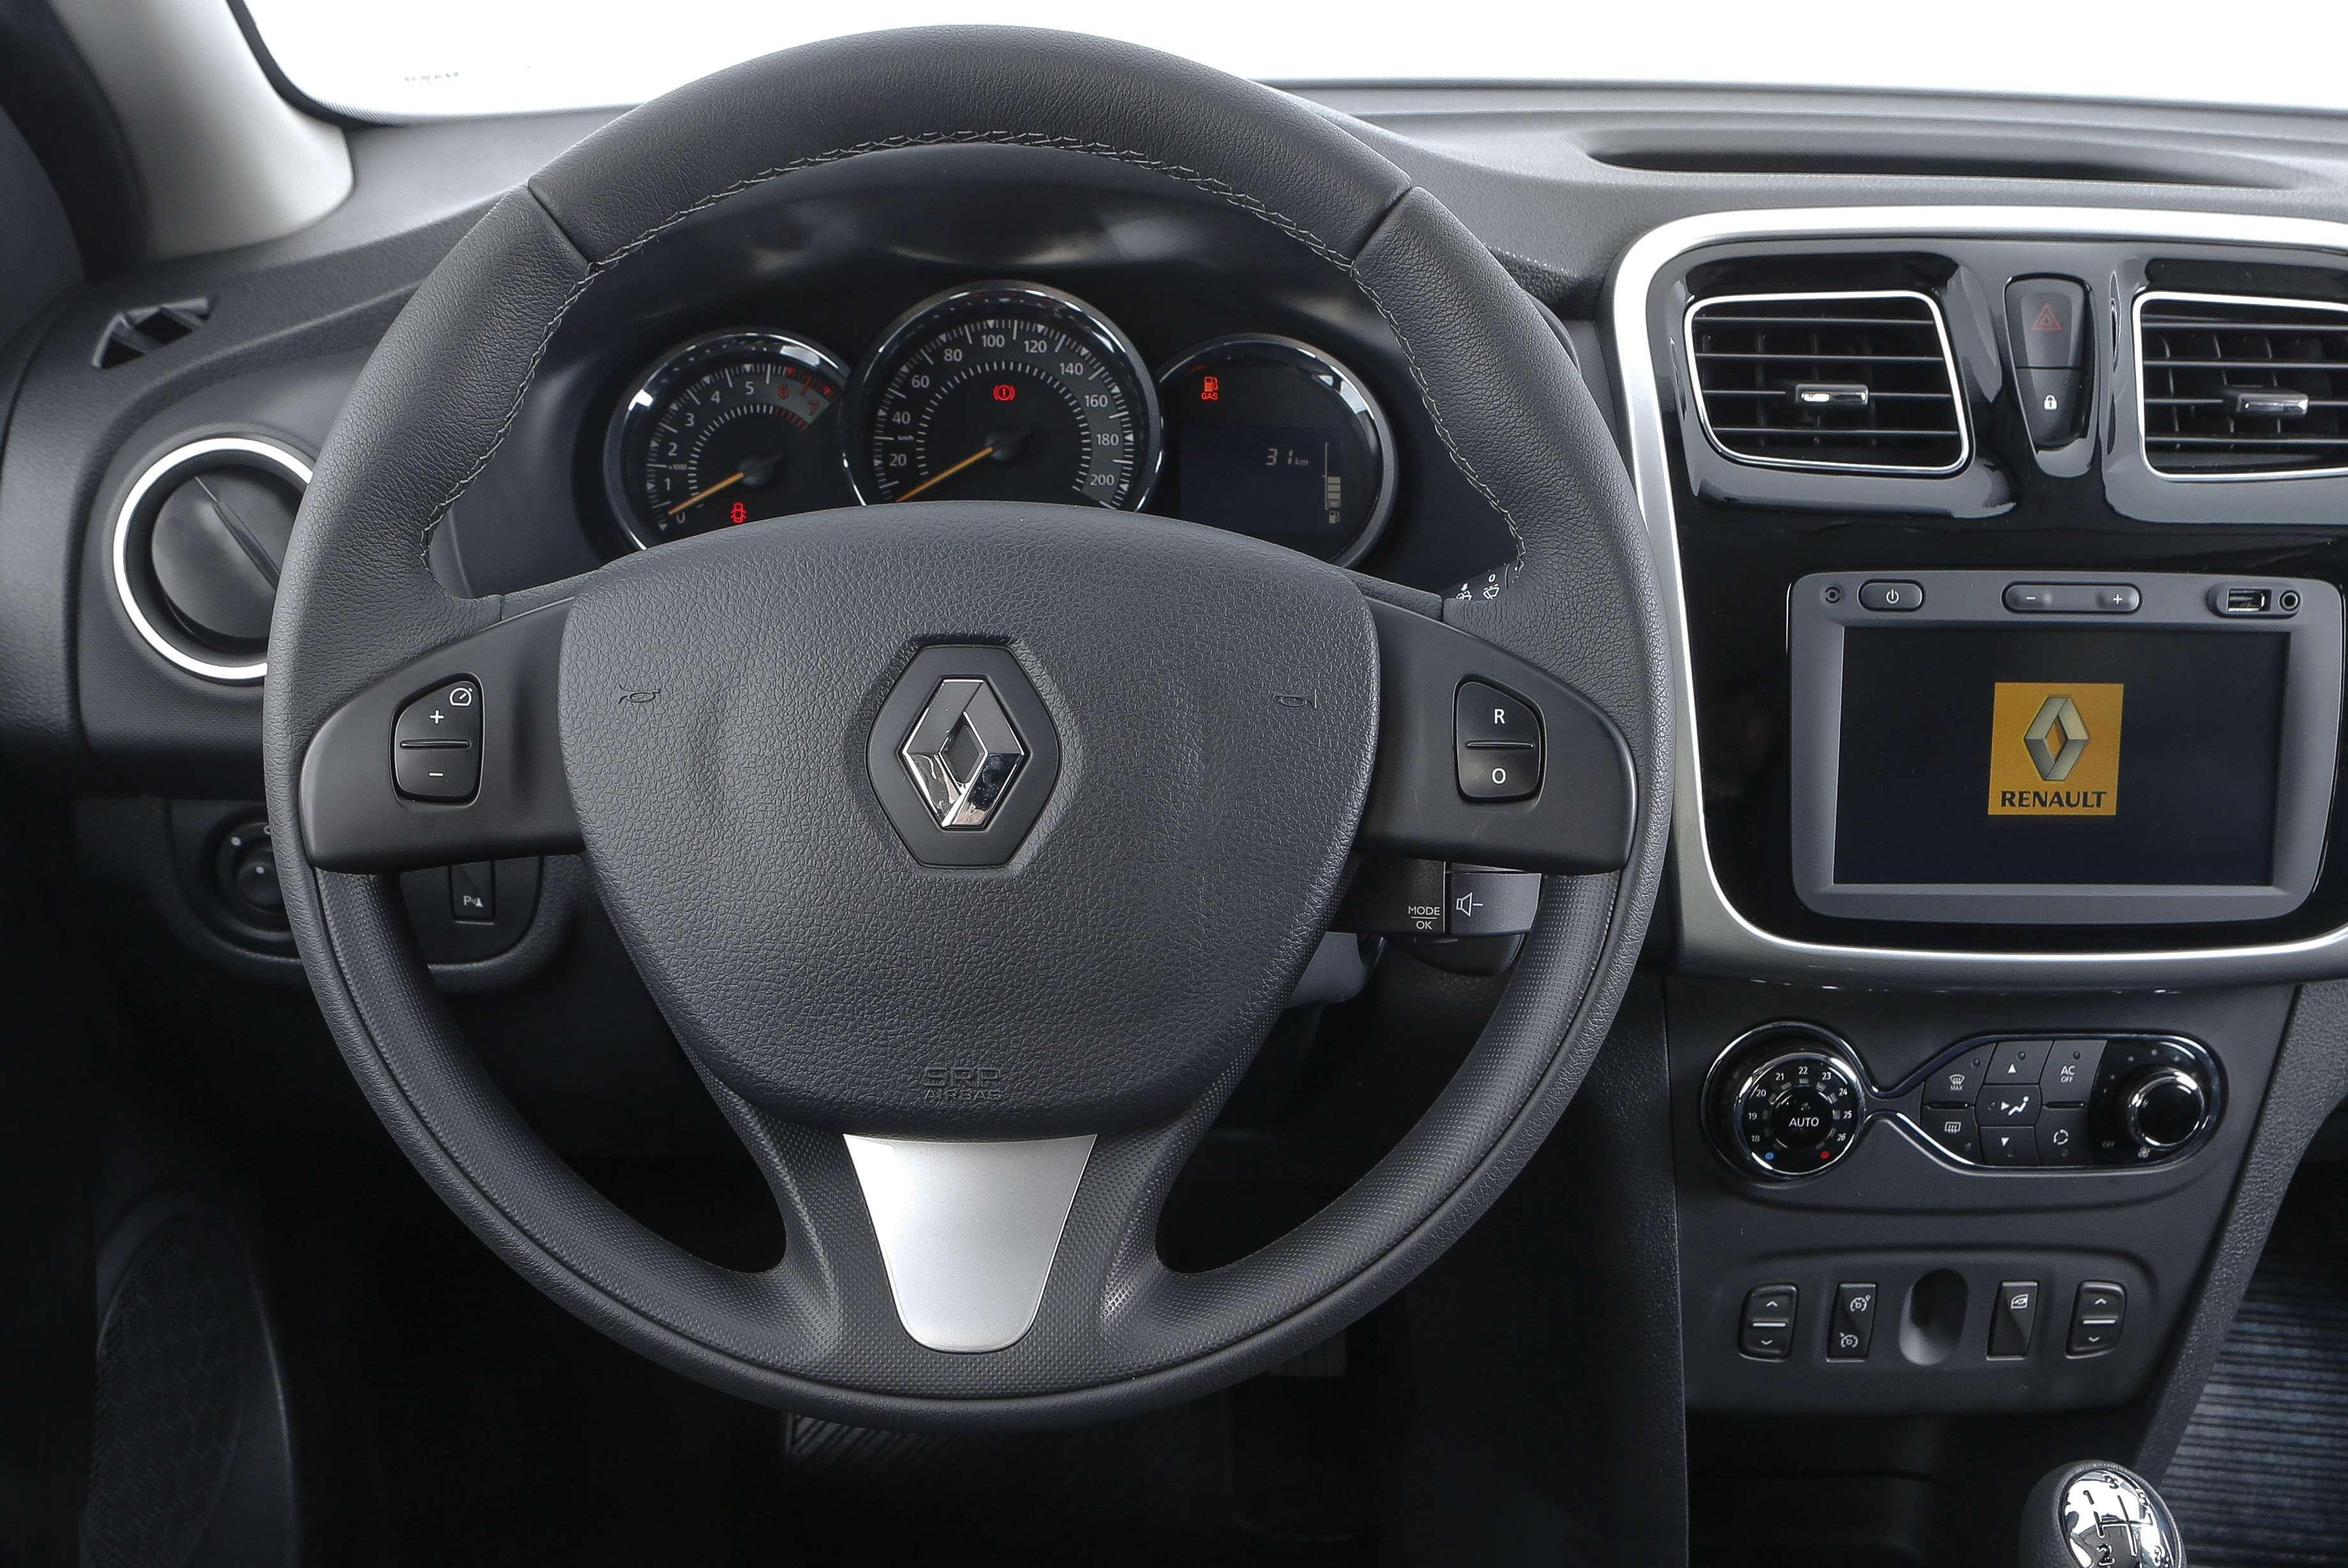 Renault pode transformar crise em vantagem na Rússia